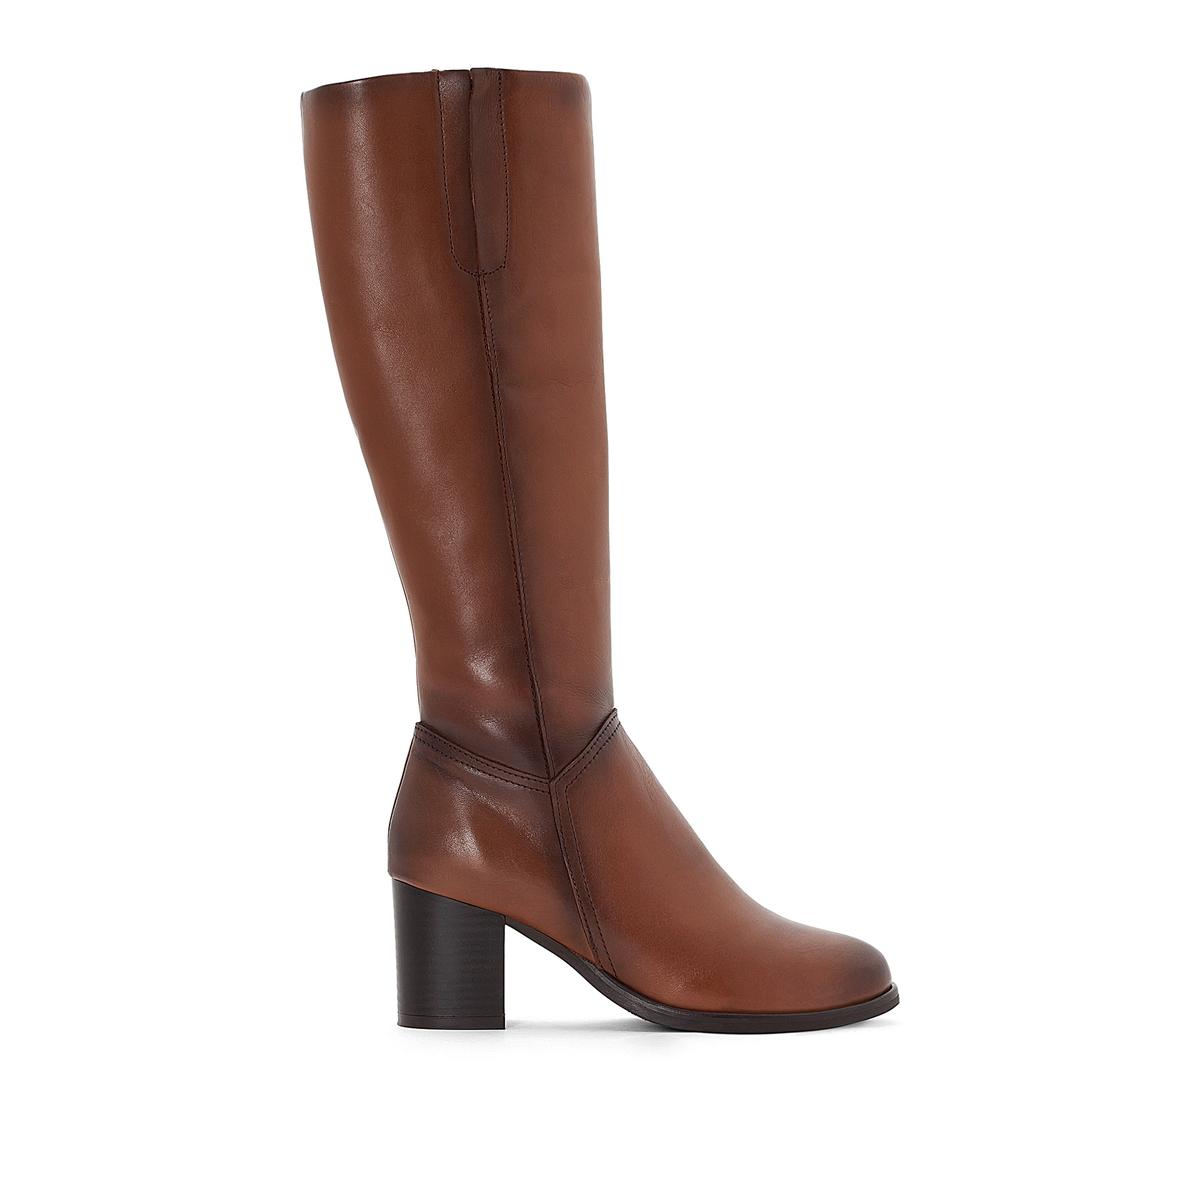 Сапоги кожаные на каблуке сапоги кожаные на плоском каблуке 1137